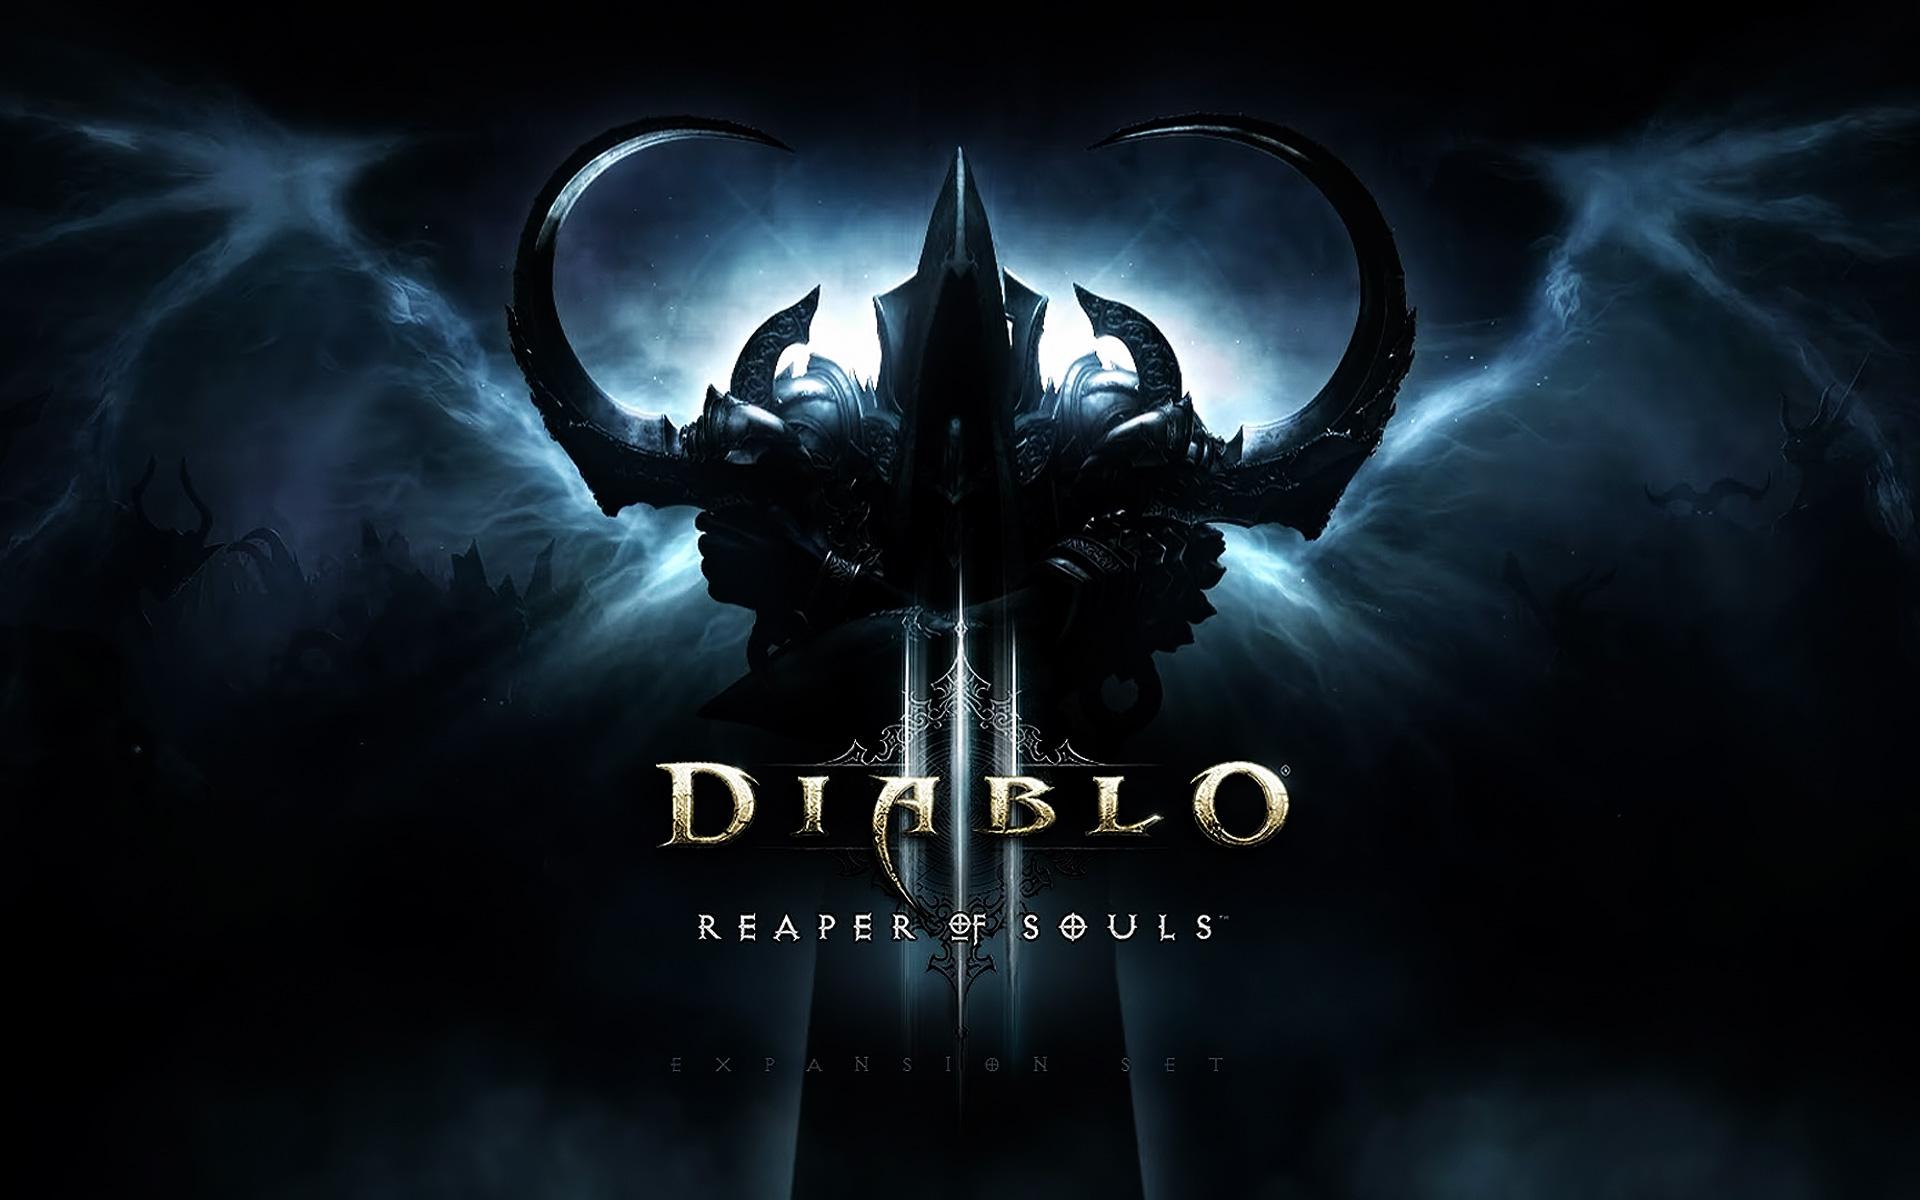 Diablo III Reaper of Souls Expansion Set